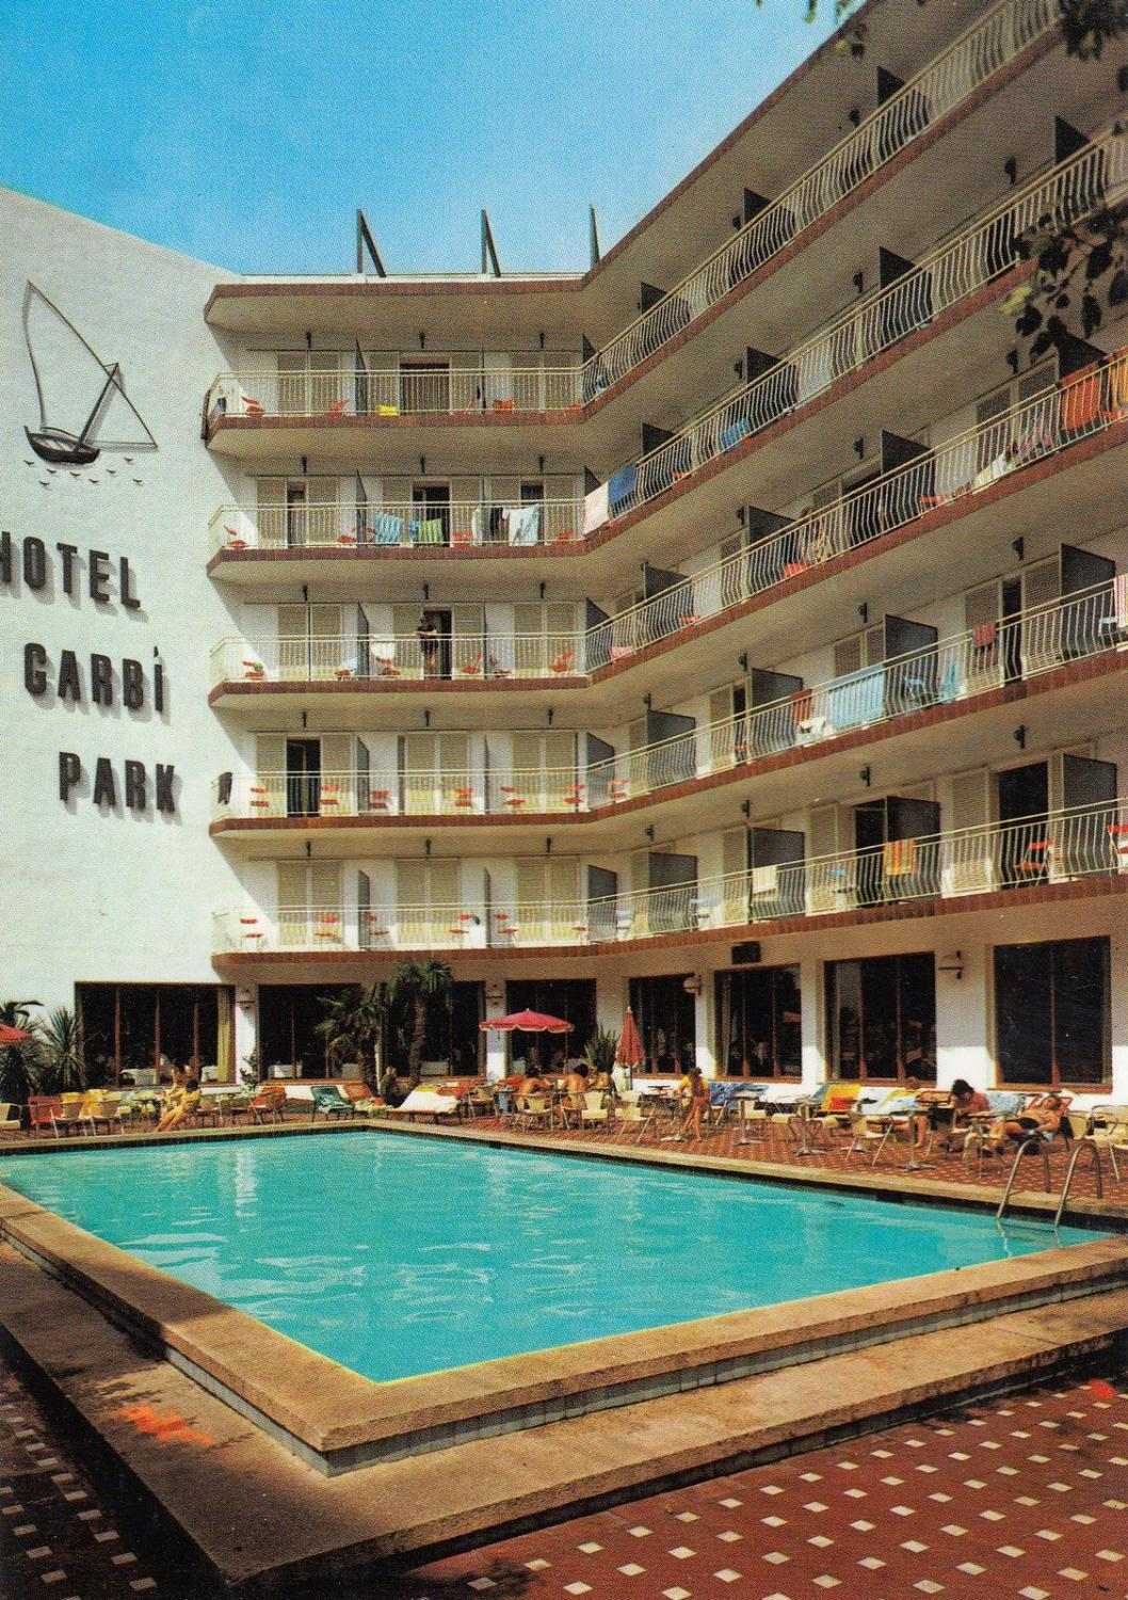 Hotel Garbi Park Lloret De Mar Swimming Pool Spanish Postcard Manuscript Nbsp Nbsp Paper Nbsp Collectible Postcard Finder